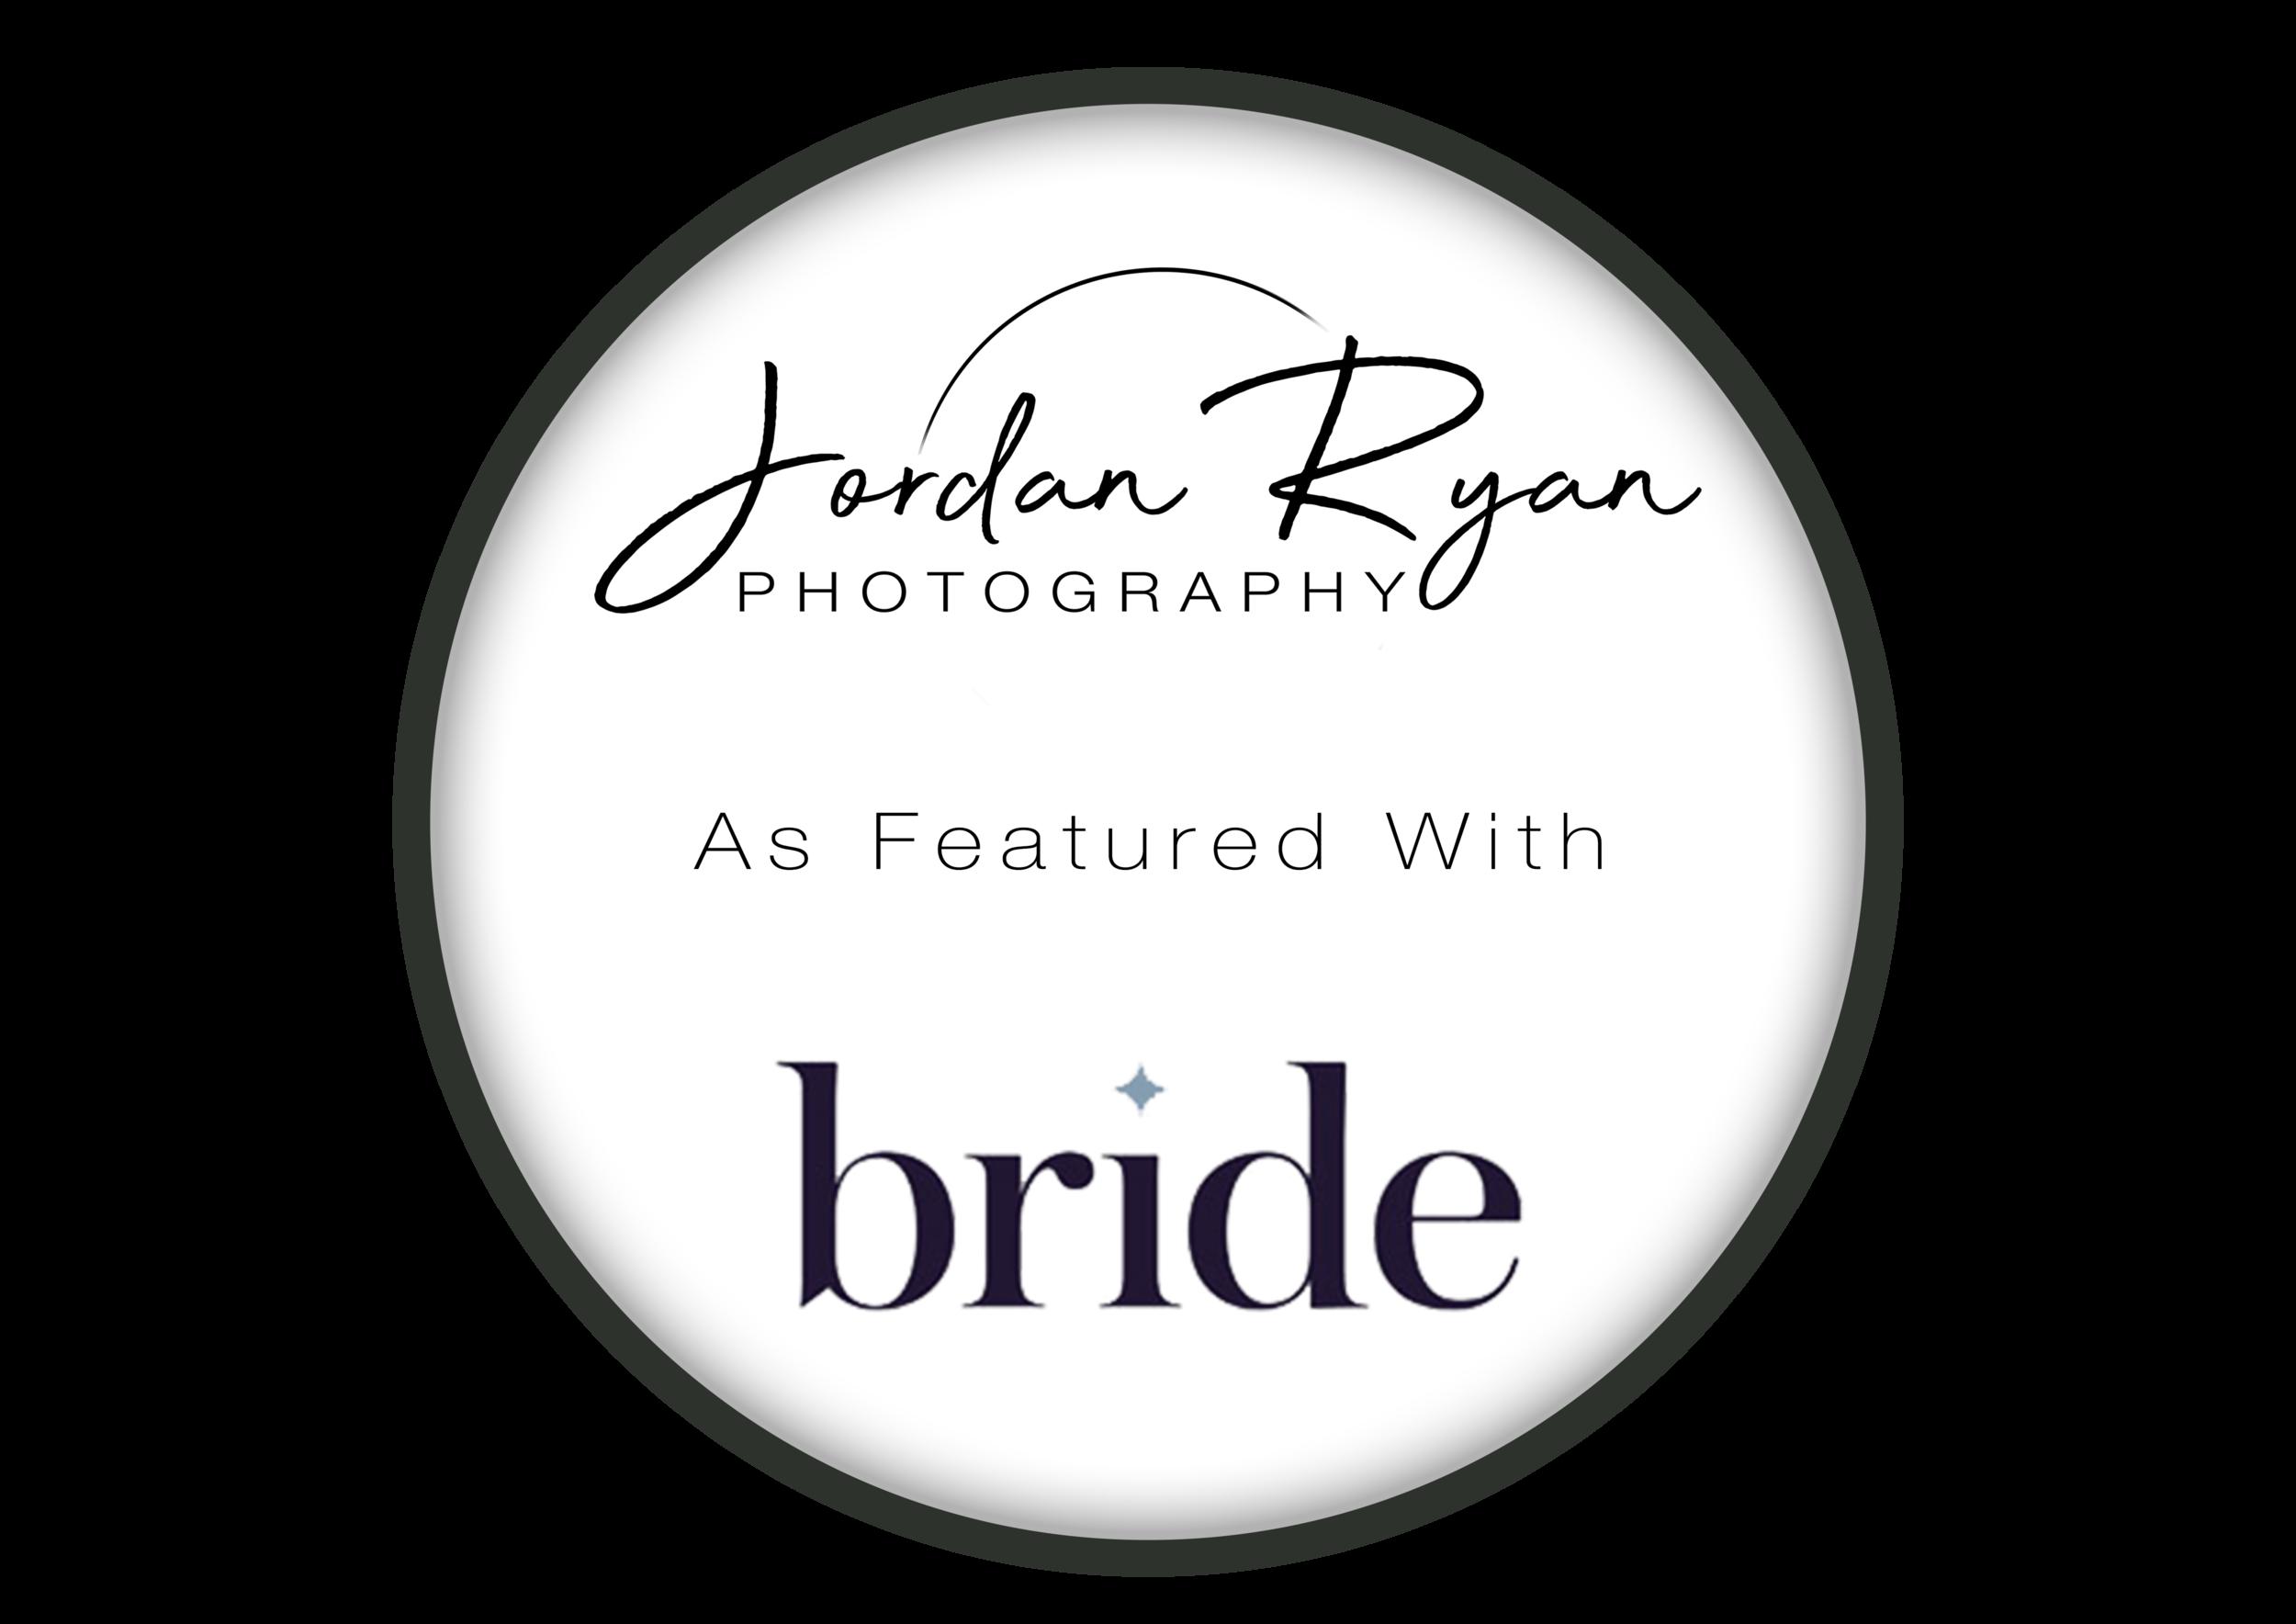 BrideMagazineBadge.png